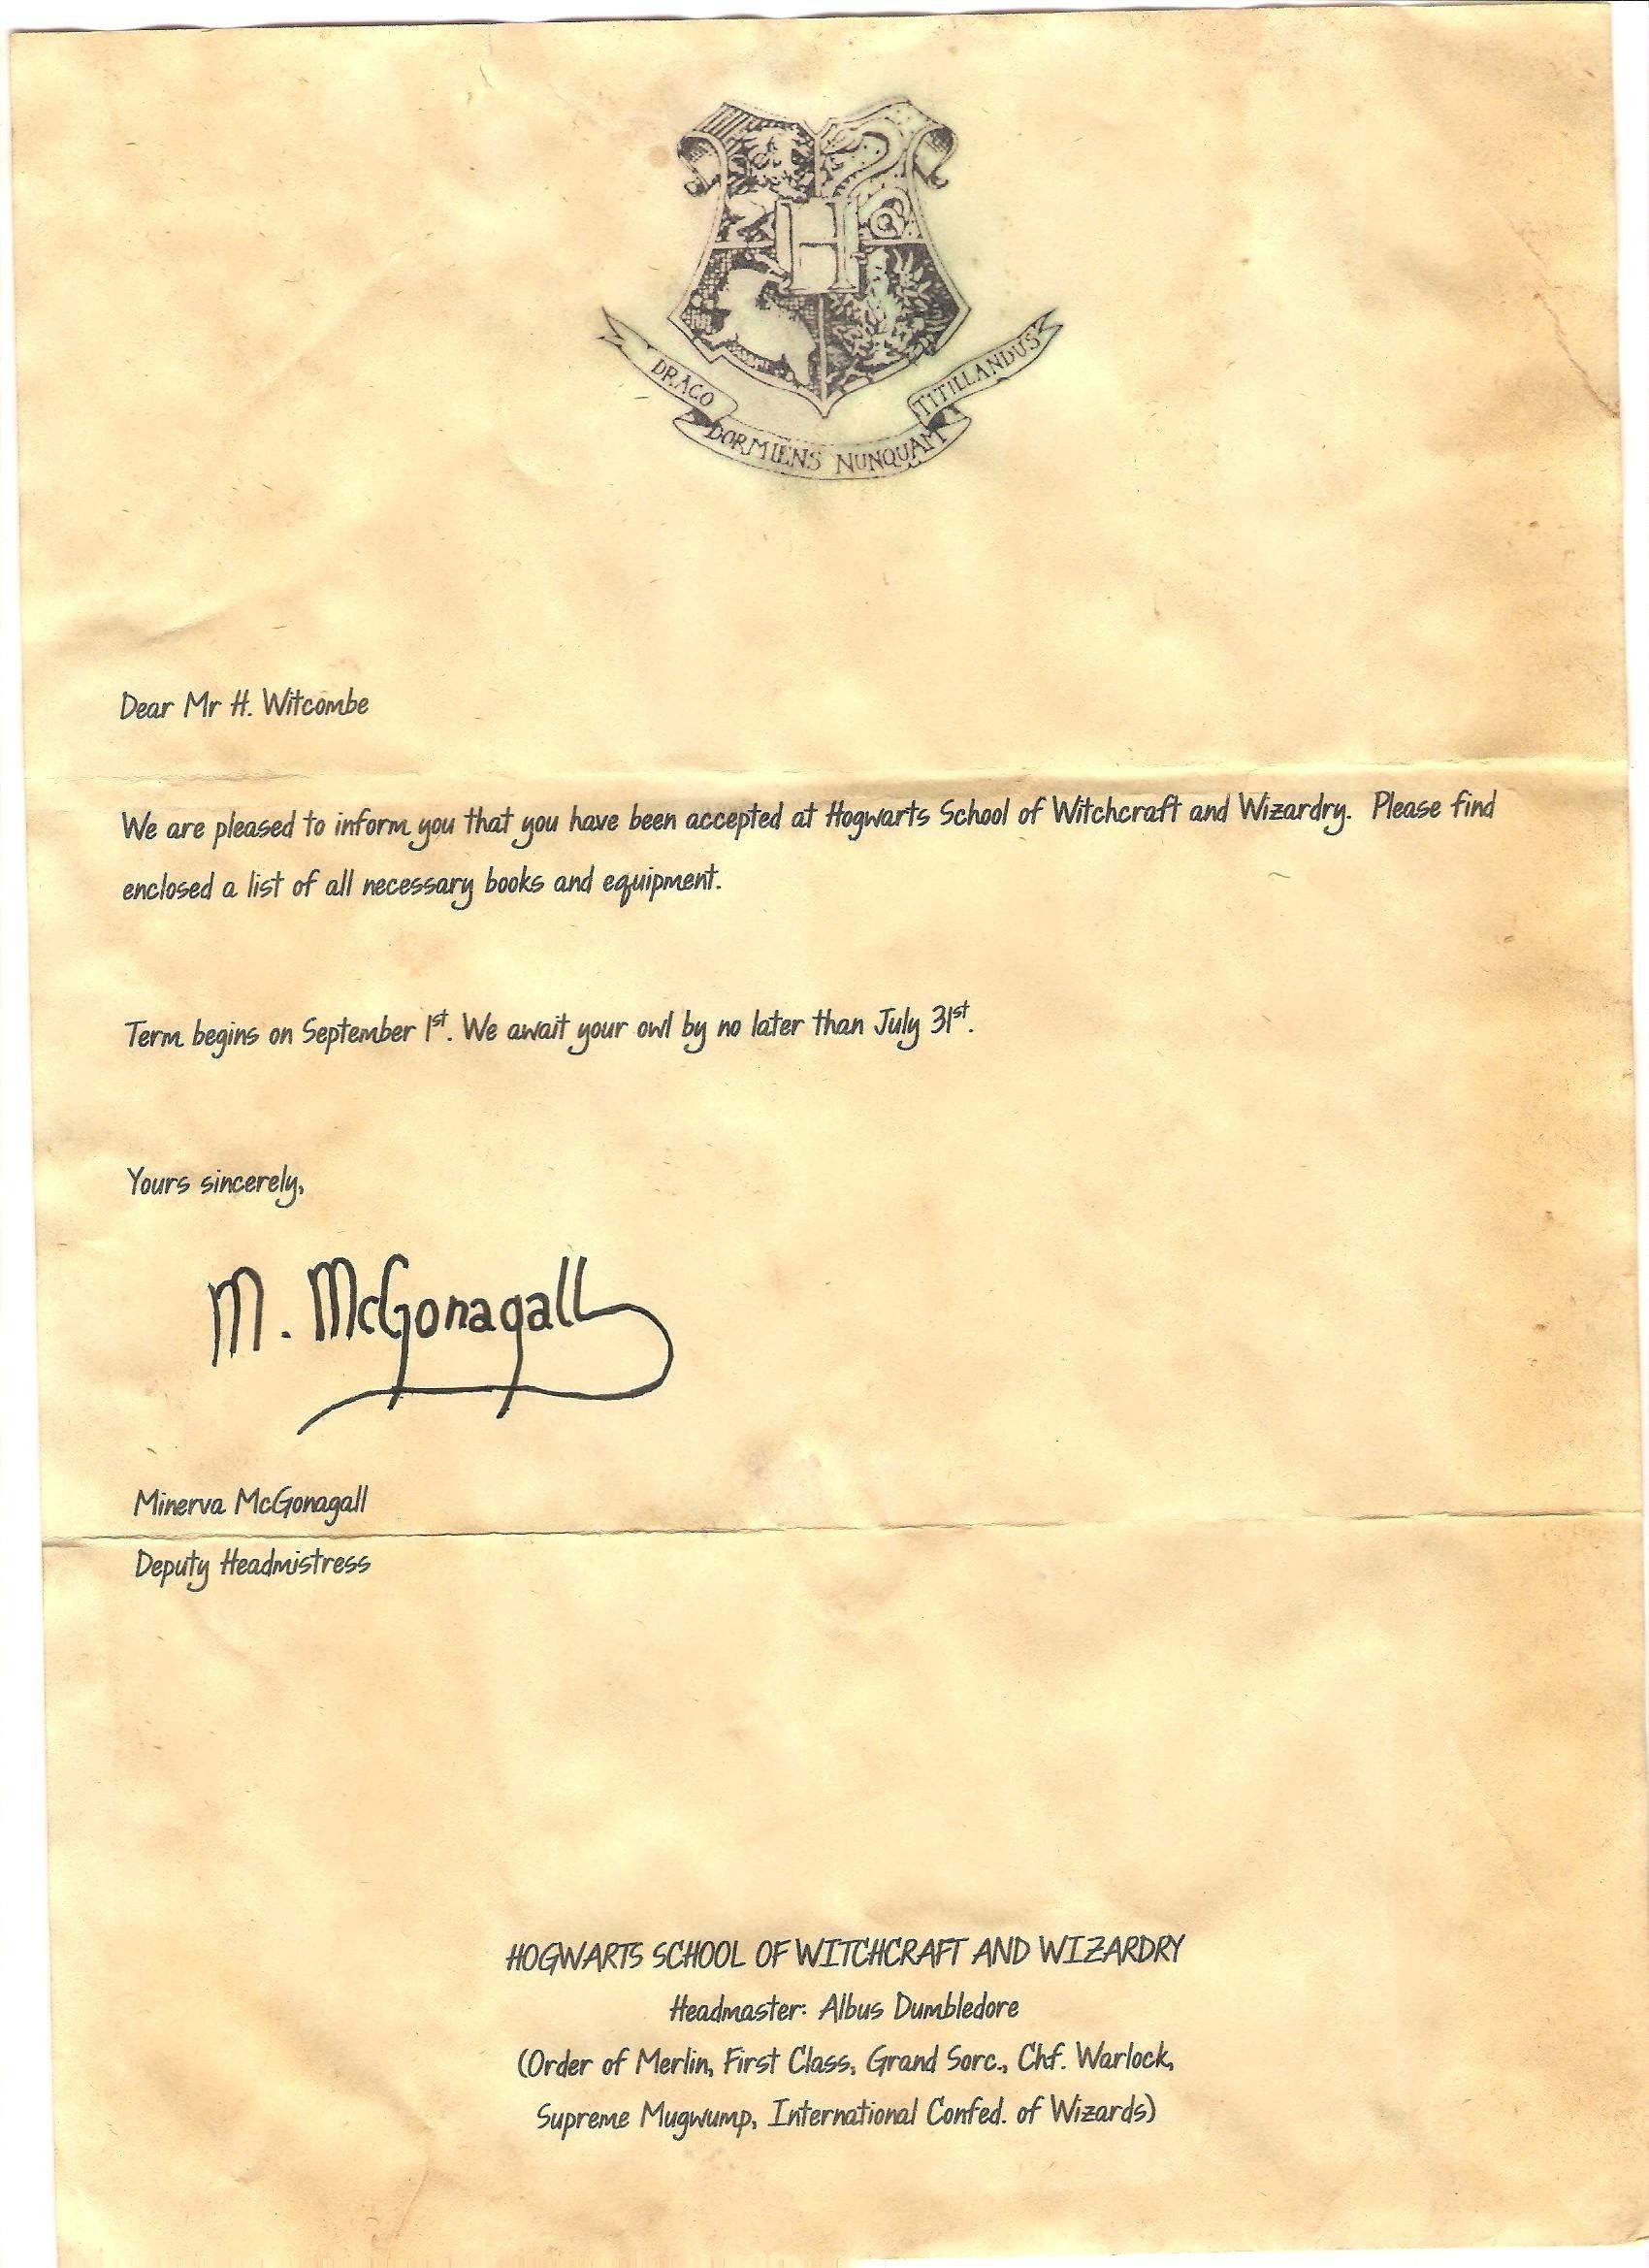 Hogwarts Letter Template Ten Top Risks Of Hogwarts Letter